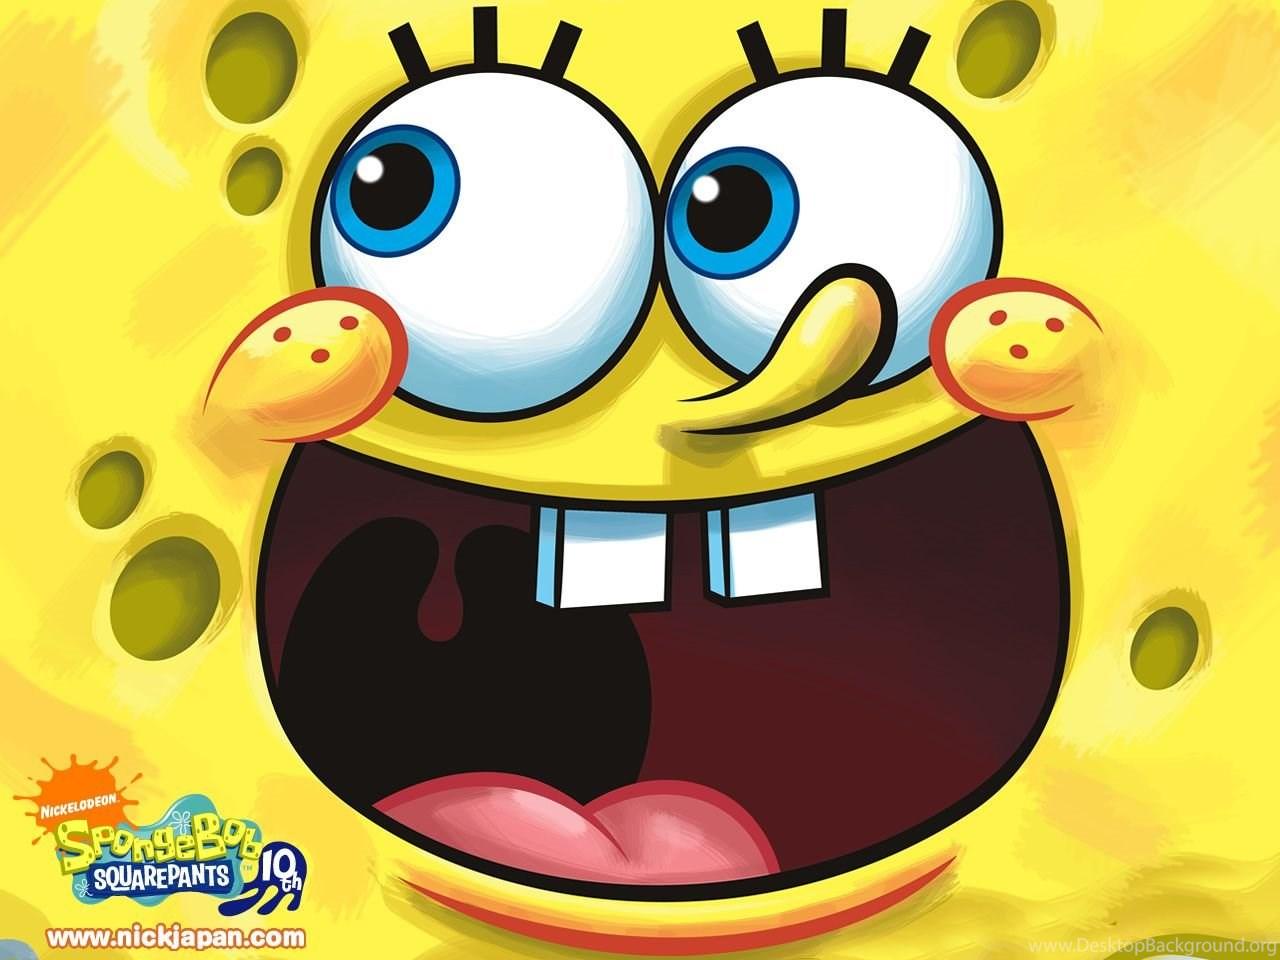 Spongebob Squarepants Character Hd Image Wallpapers For Iphone 6